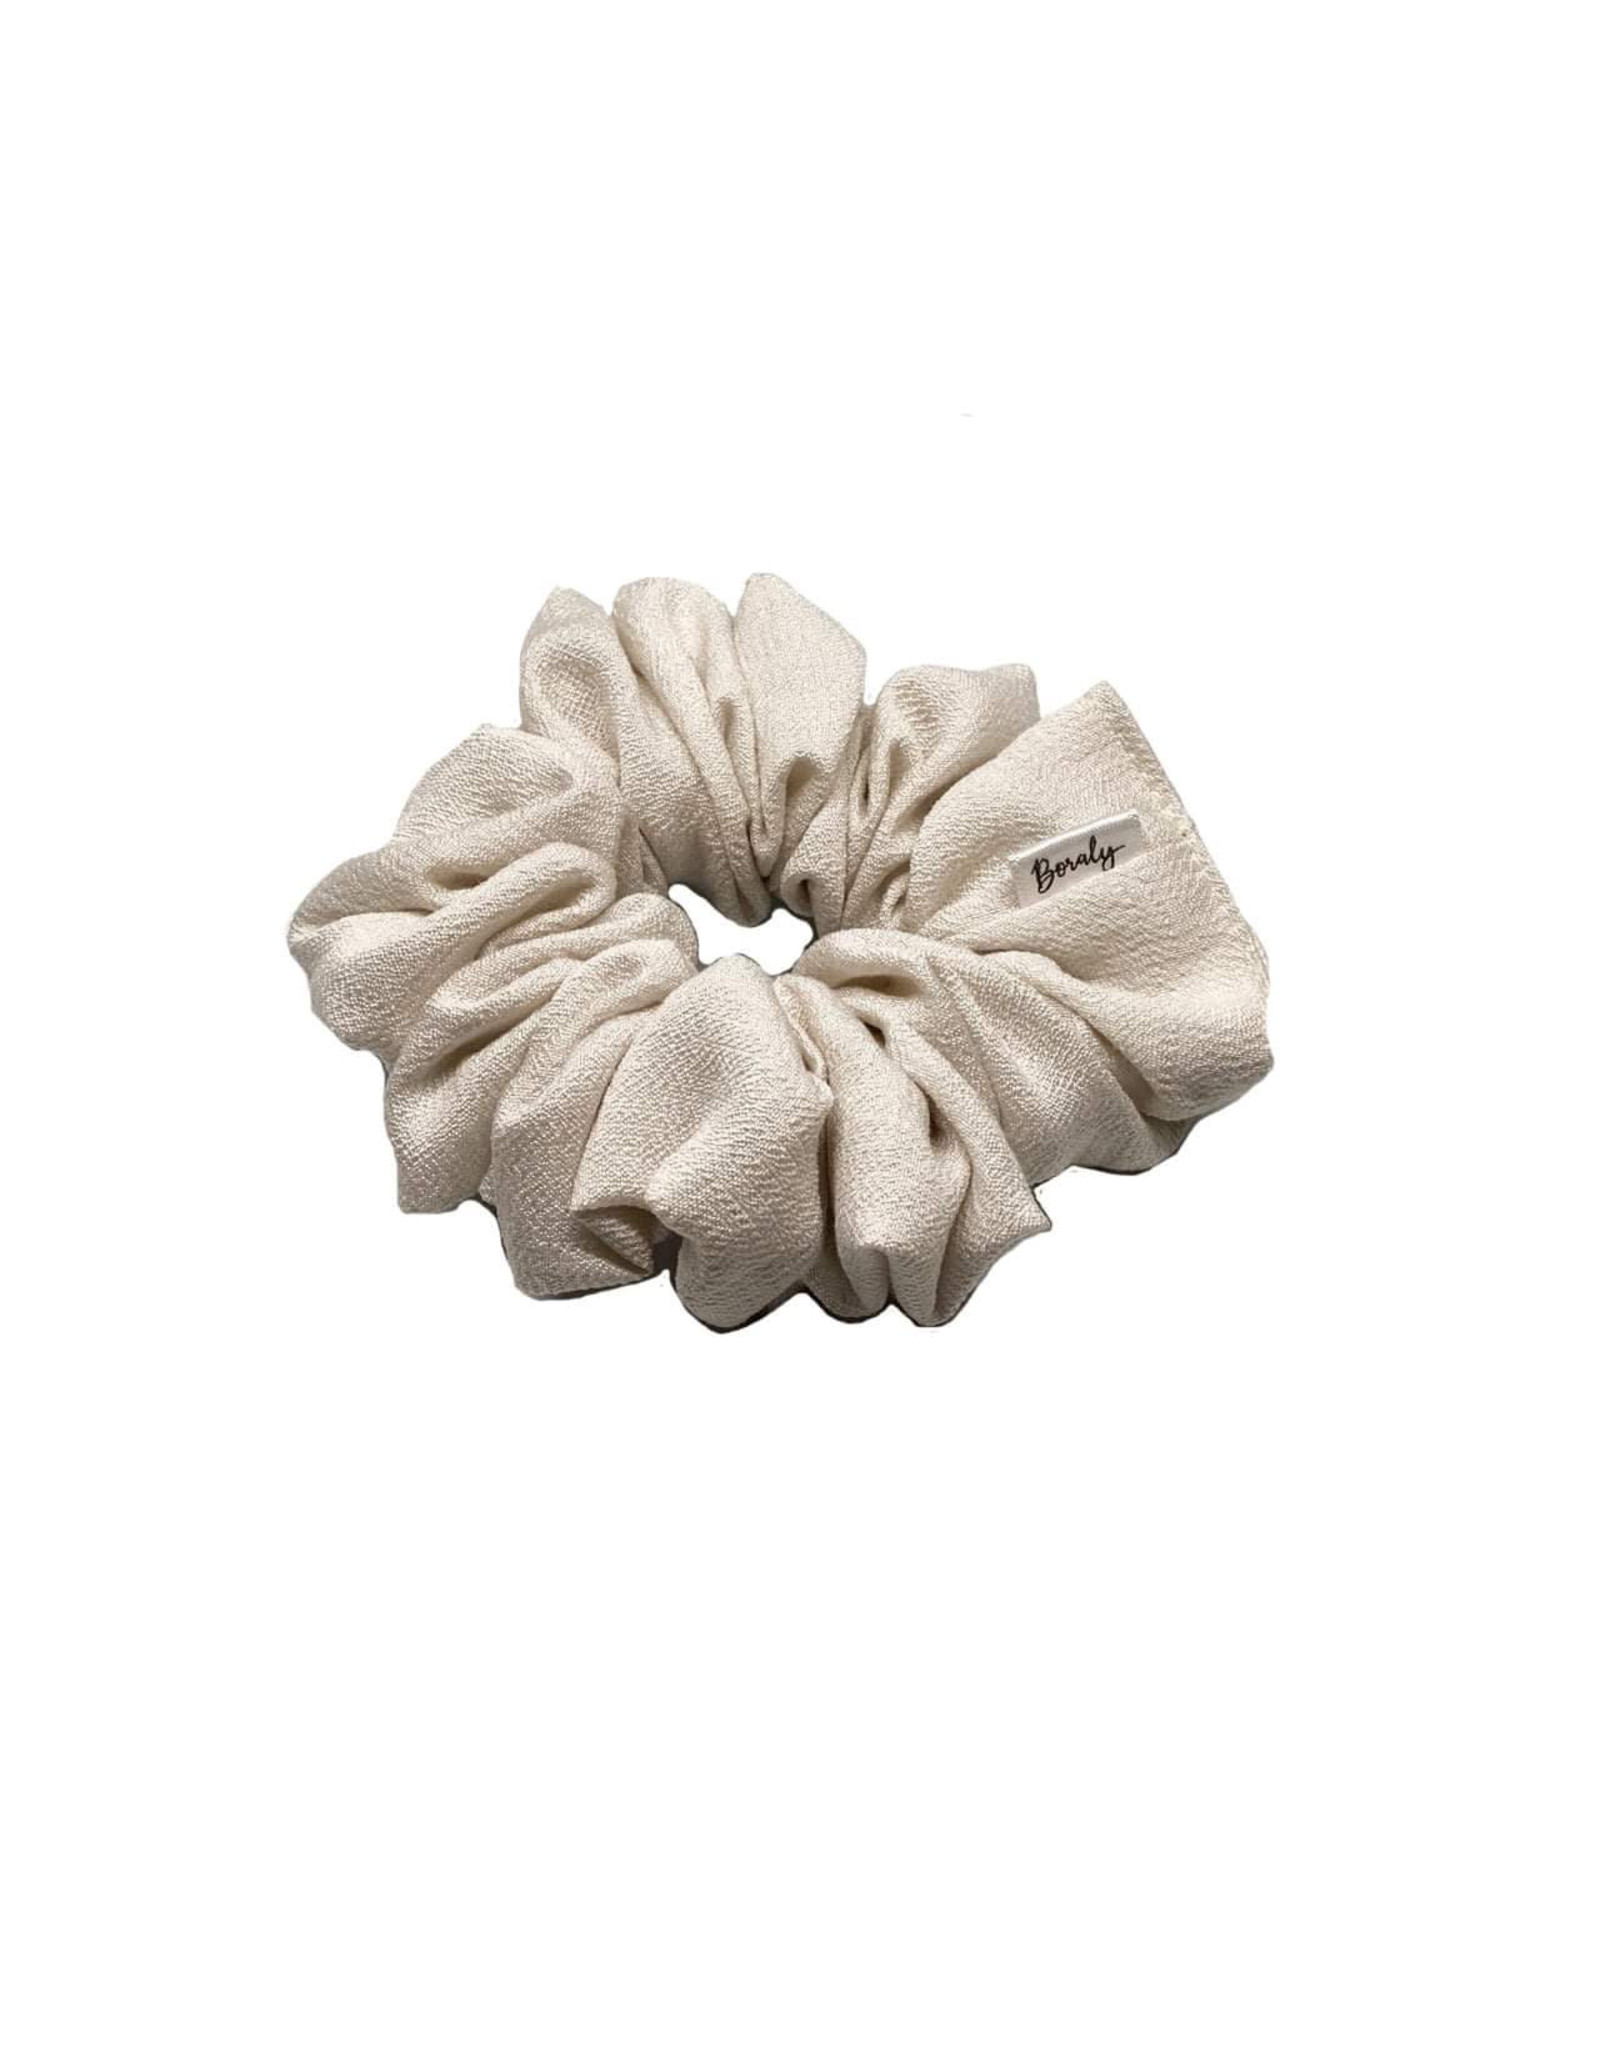 Boraly créations Chouchou - Lin ivoire